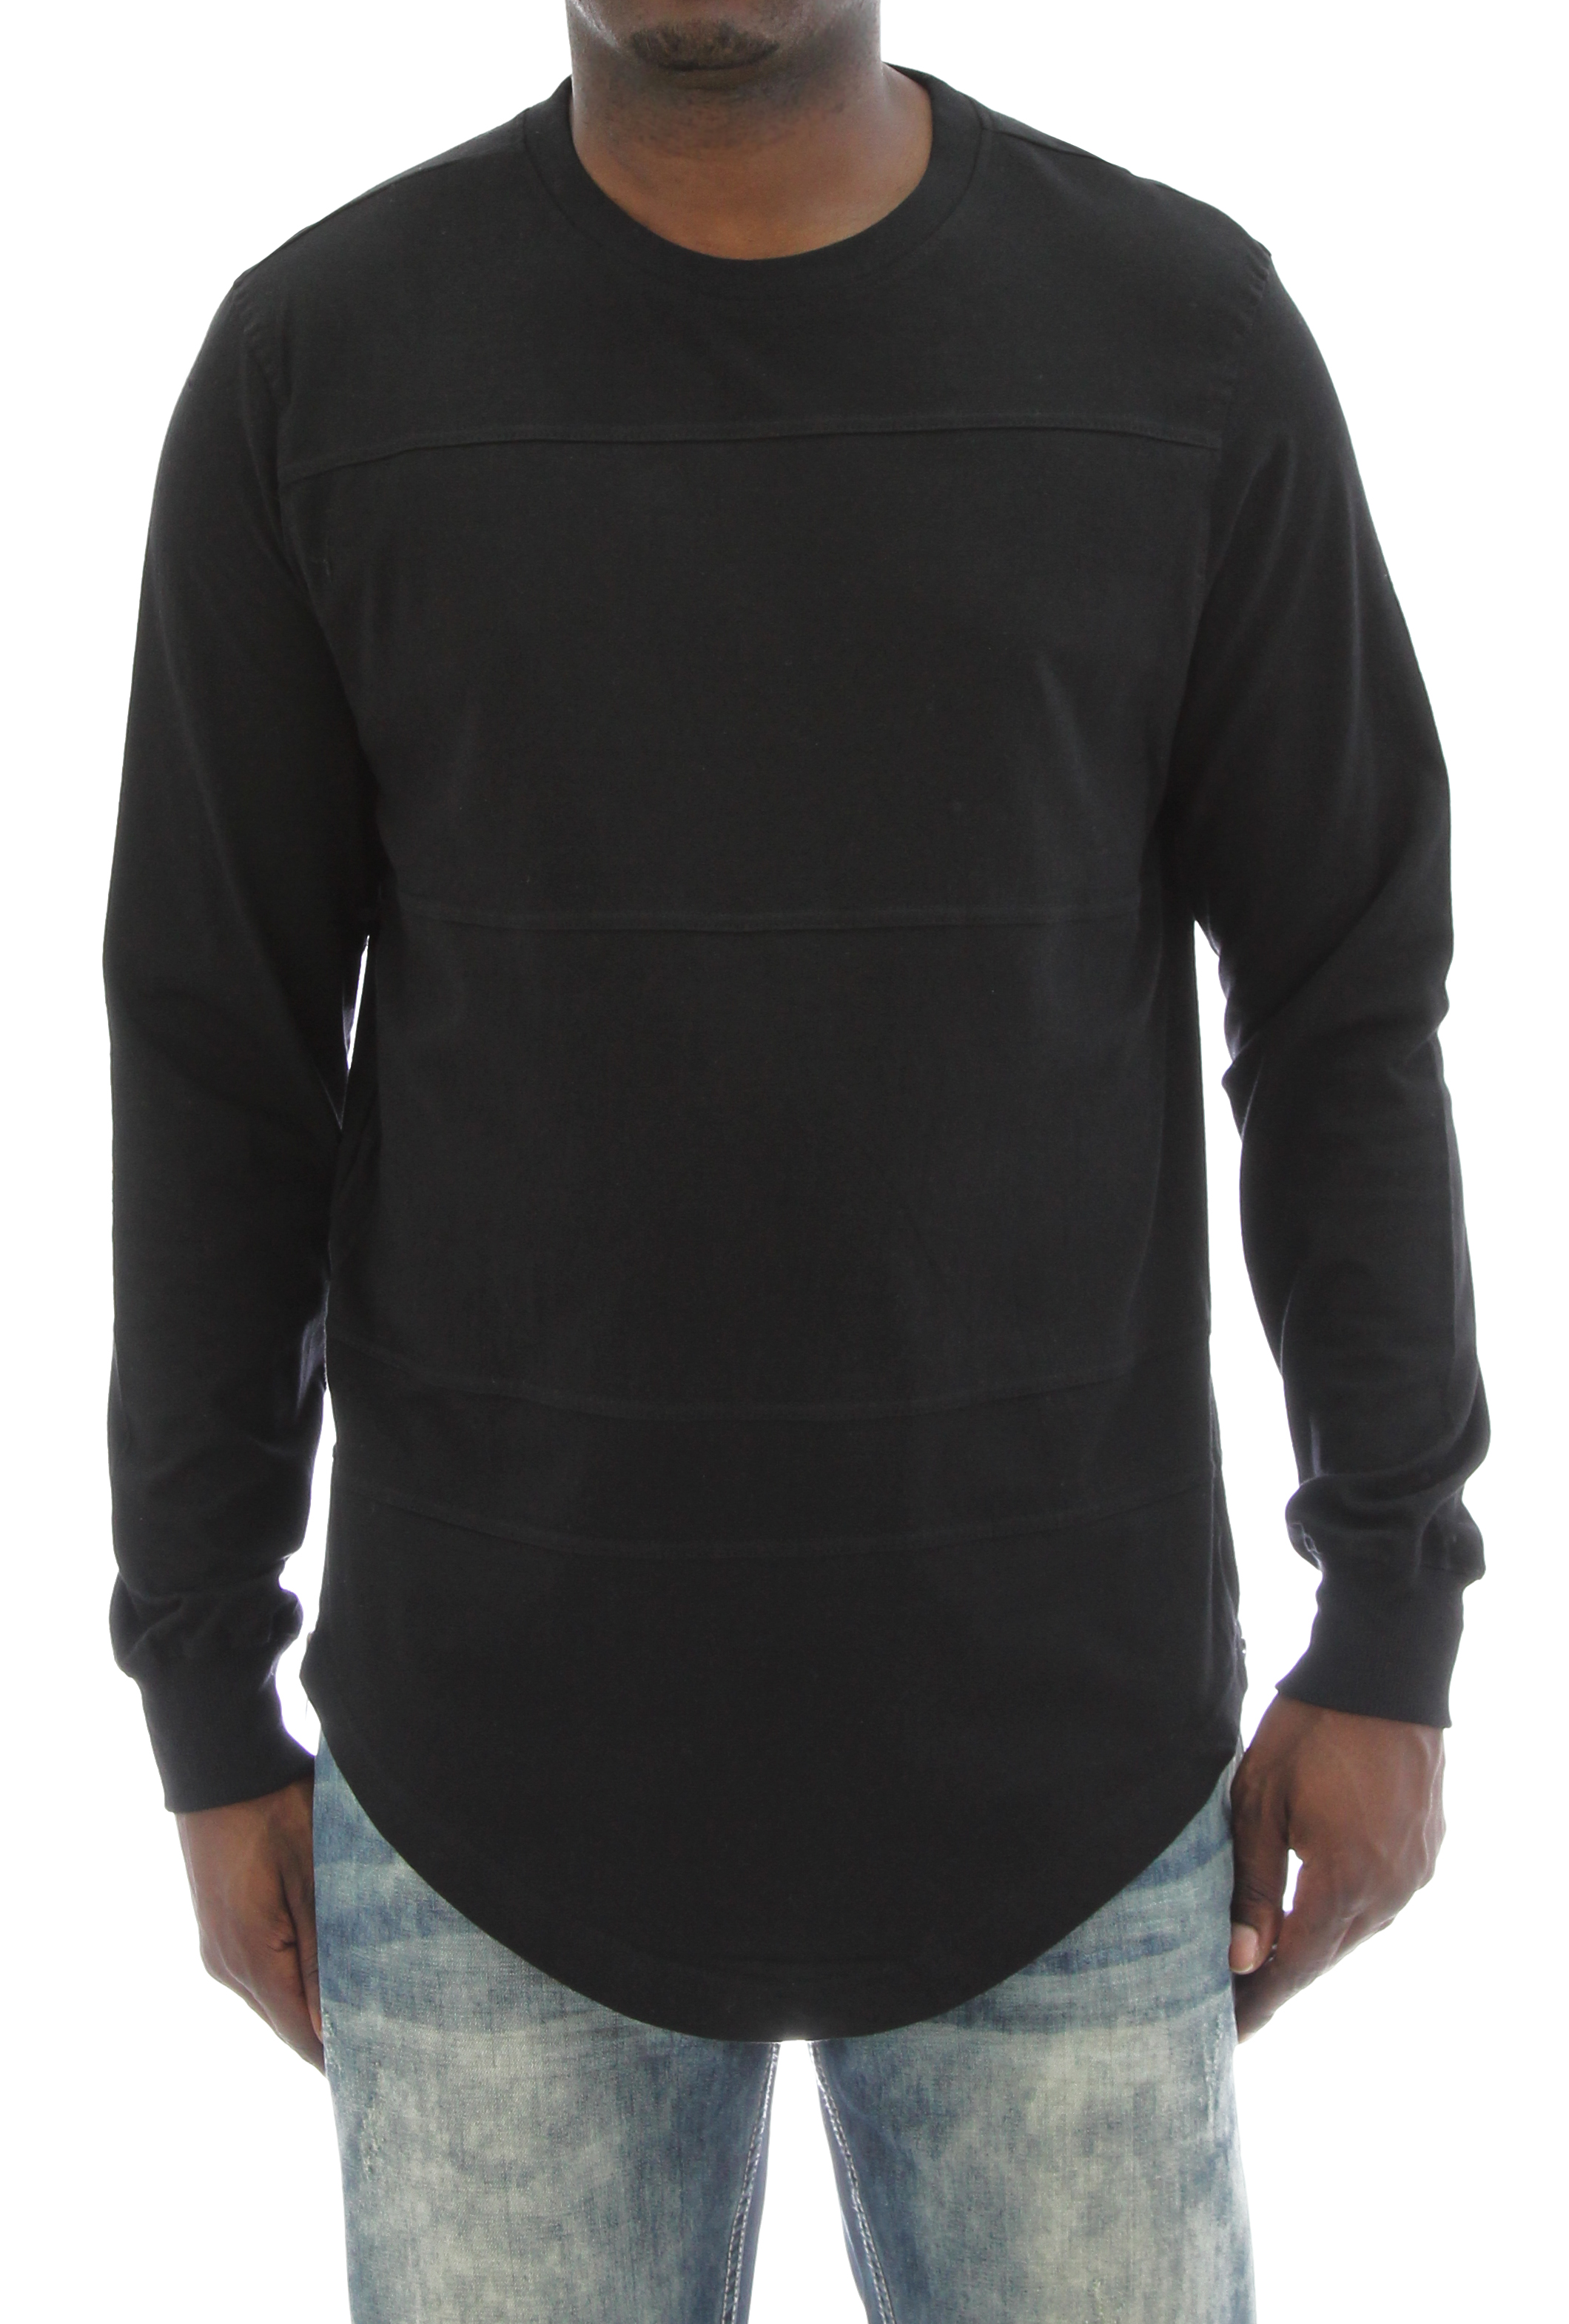 ecd2127e5 Akademiks Men's Olympic Longline Side Zippers Long Sleeve T Shirt   eBay